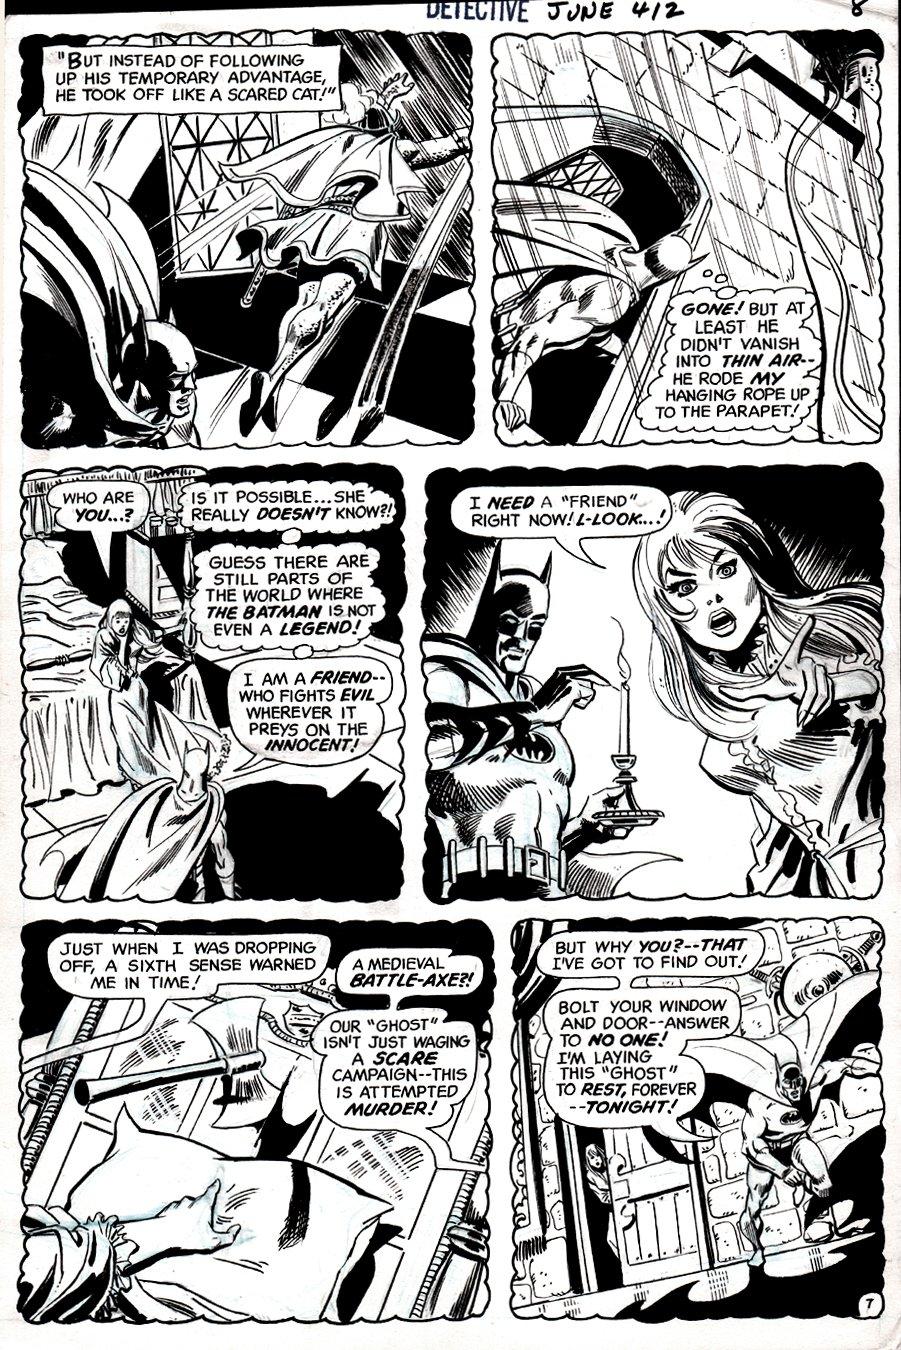 Detective Comics #412 p 7 (Batman In 5 Of 6 Panels!) 1971